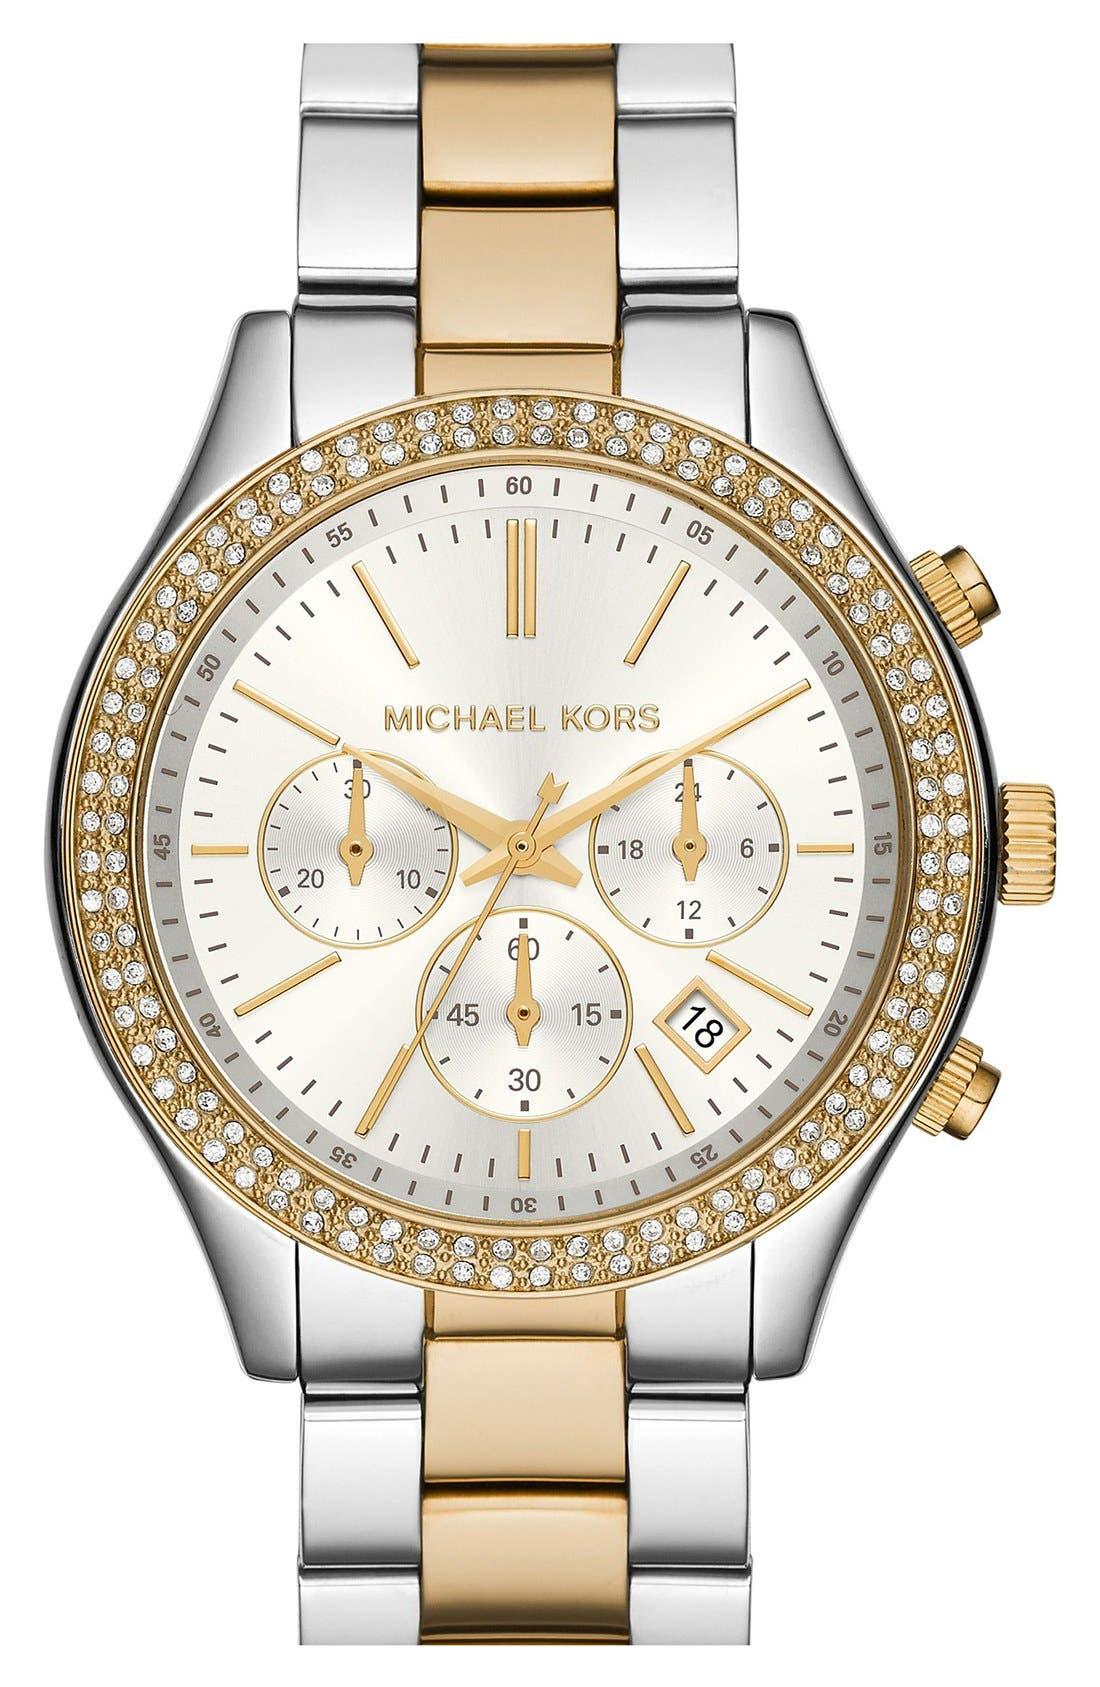 Main Image - Michael Kors 'Slim Runway' Crystal Bezel Chronograph Bracelet Watch, 42mm (Nordstrom Exclusive)